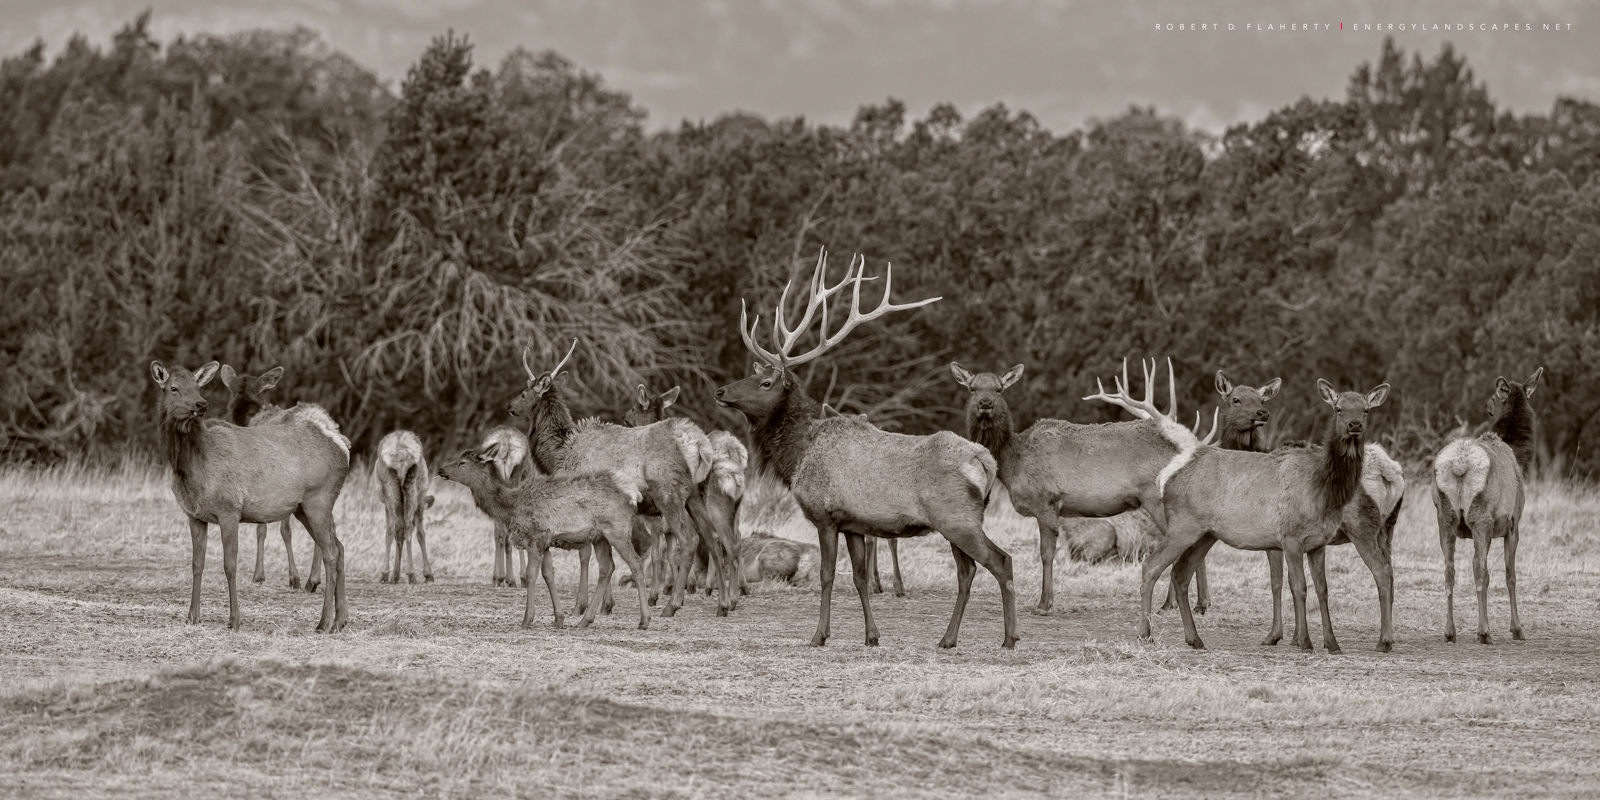 Elk, Spring, Capitan Ranch, Capitan New Mexico, Spring, Warm, Ruidoso New Mexico, sepia, black & white photography, sepia photography, fine art photography, fine art landscape photography, March, Capi, photo